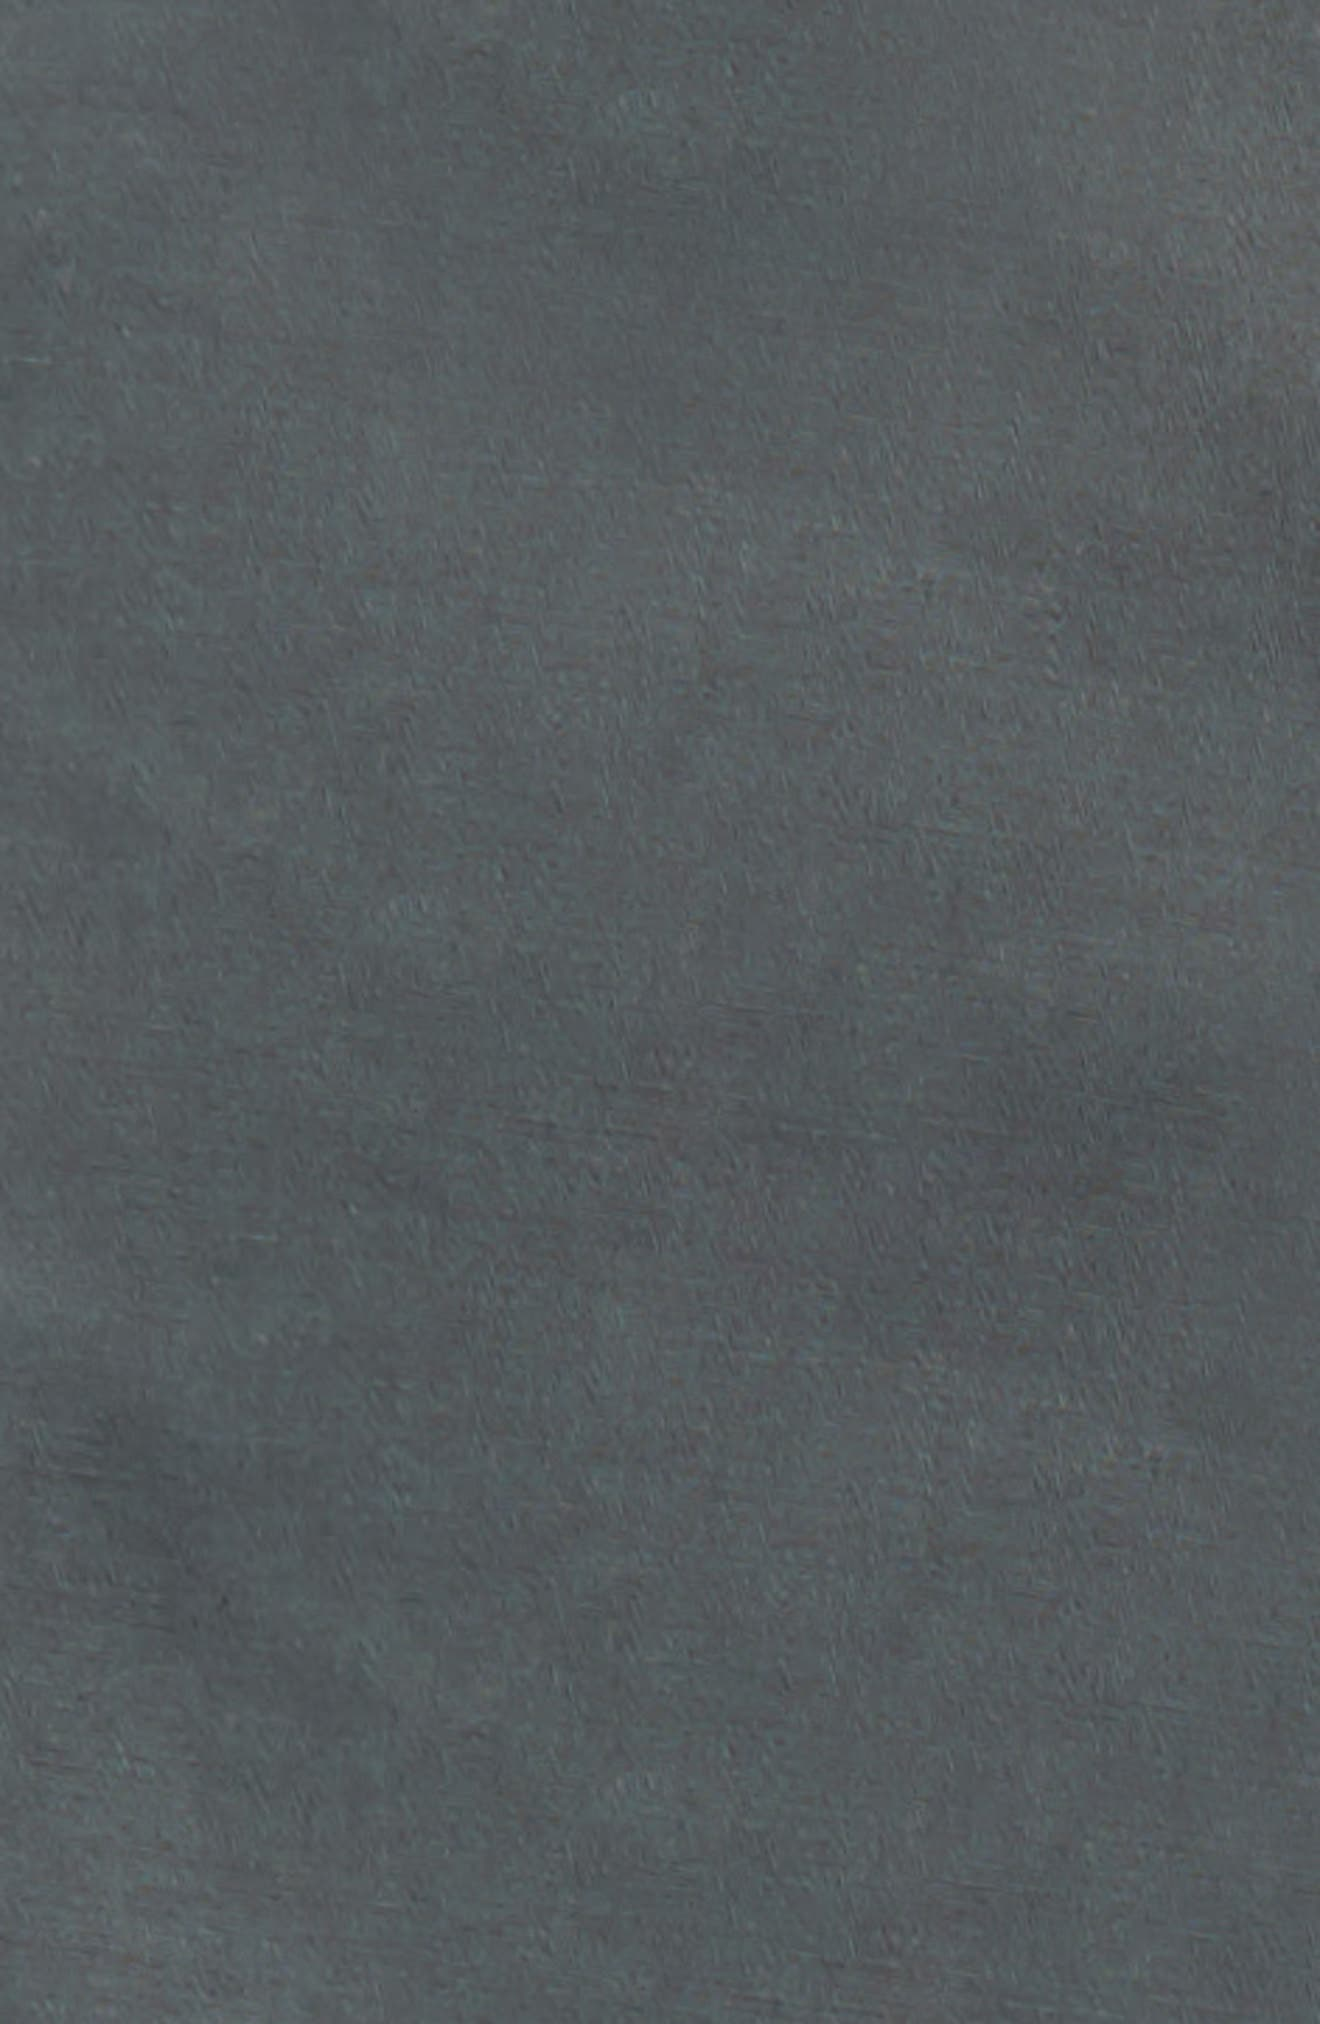 Hudson Jeans Jagger Slim Fit Straight Leg Pants,                             Alternate thumbnail 3, color,                             099